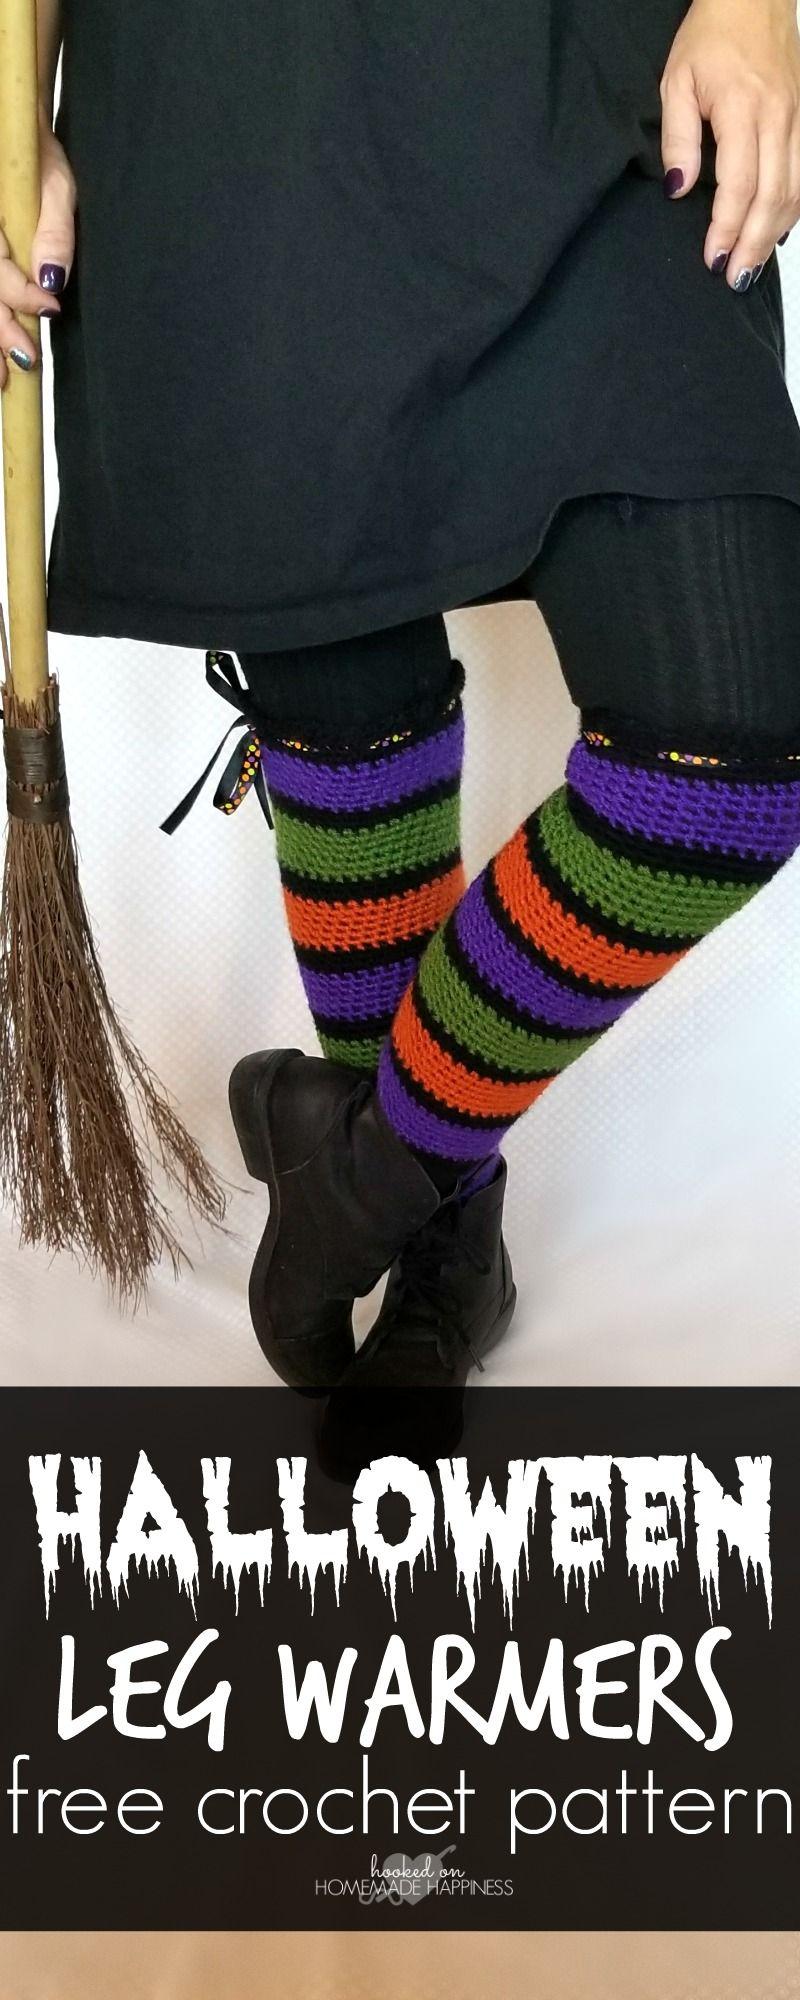 Halloween crochet leg warmers leg warmers halloween and legs halloween crochet leg warmers bankloansurffo Image collections